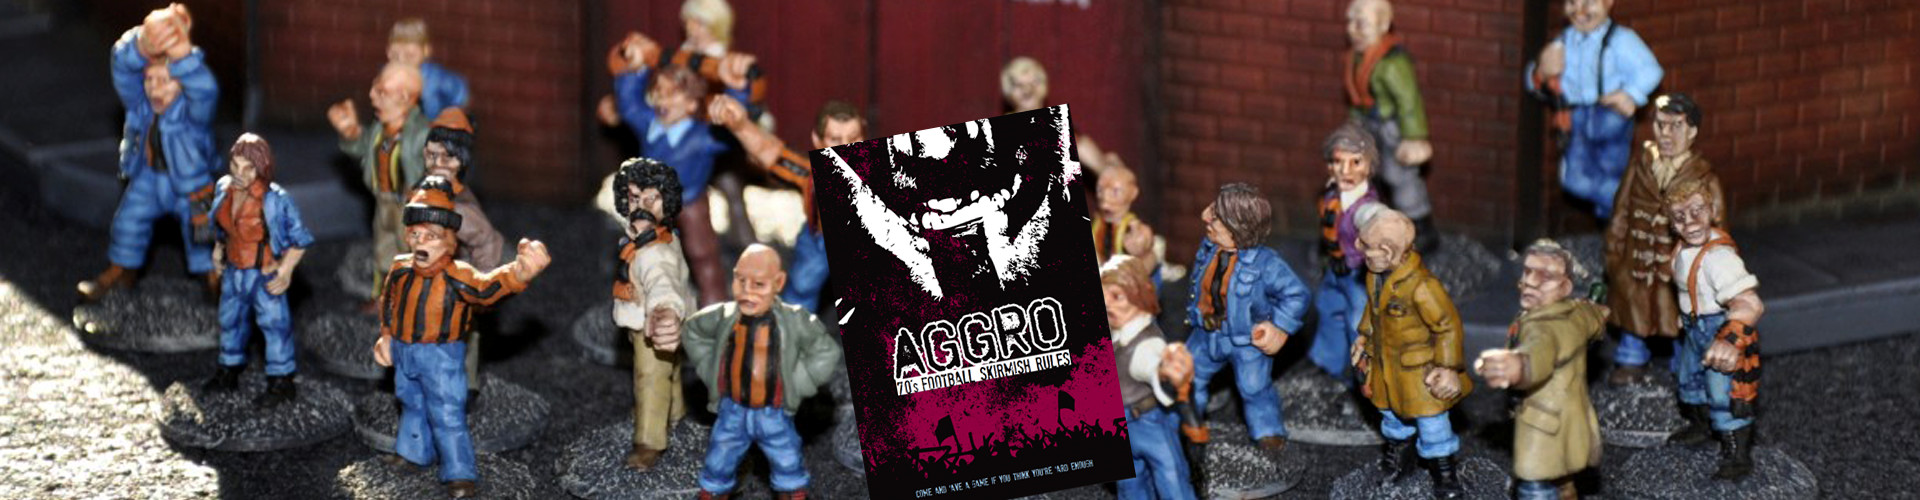 DEMO 01 Aggro - Demospiele: AGGRO